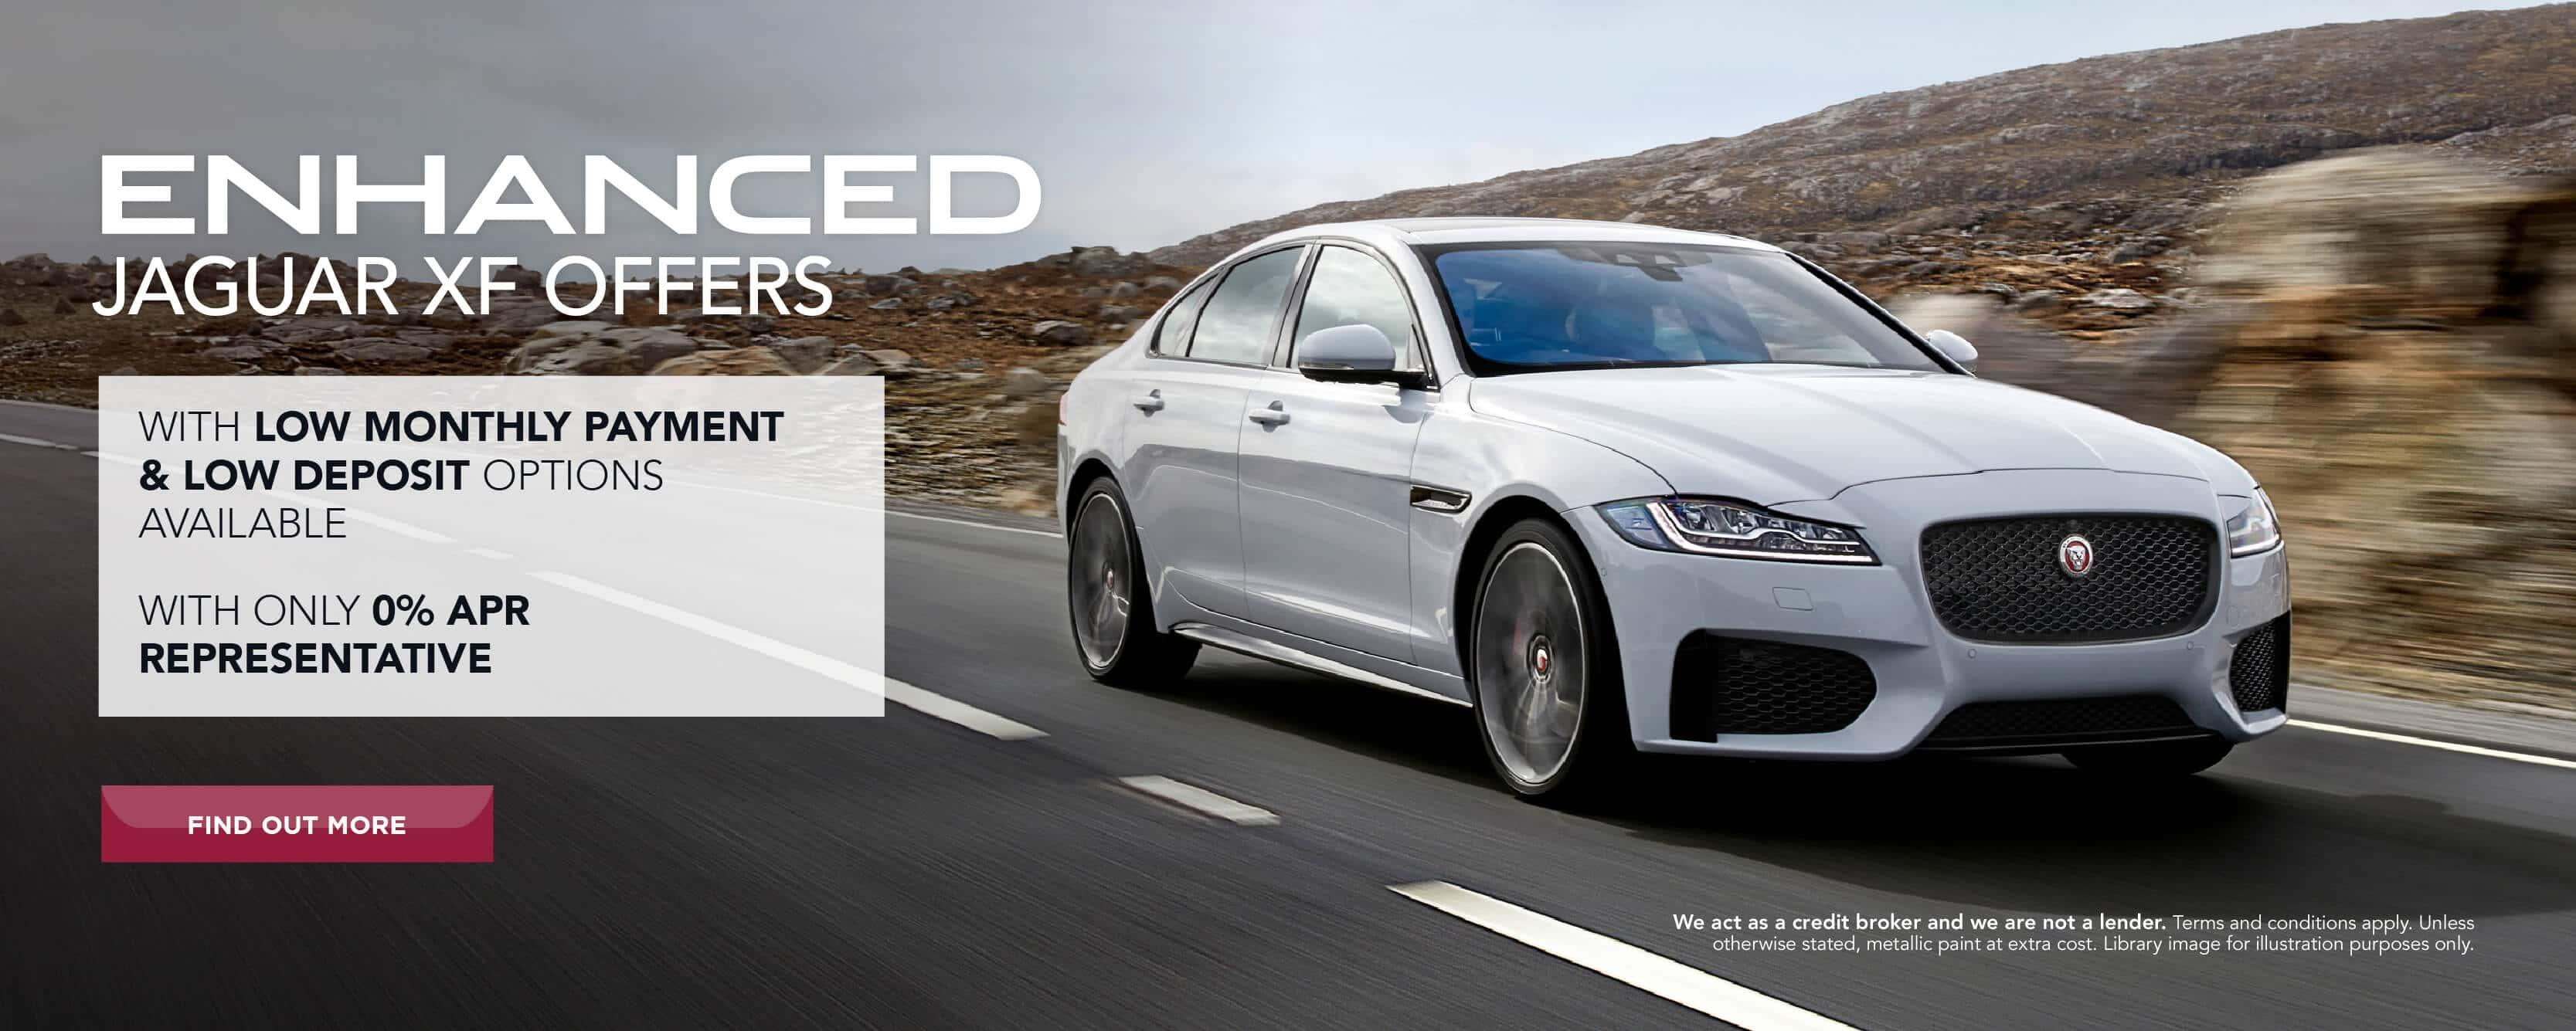 Jaguar Enhanced XF Offers BB